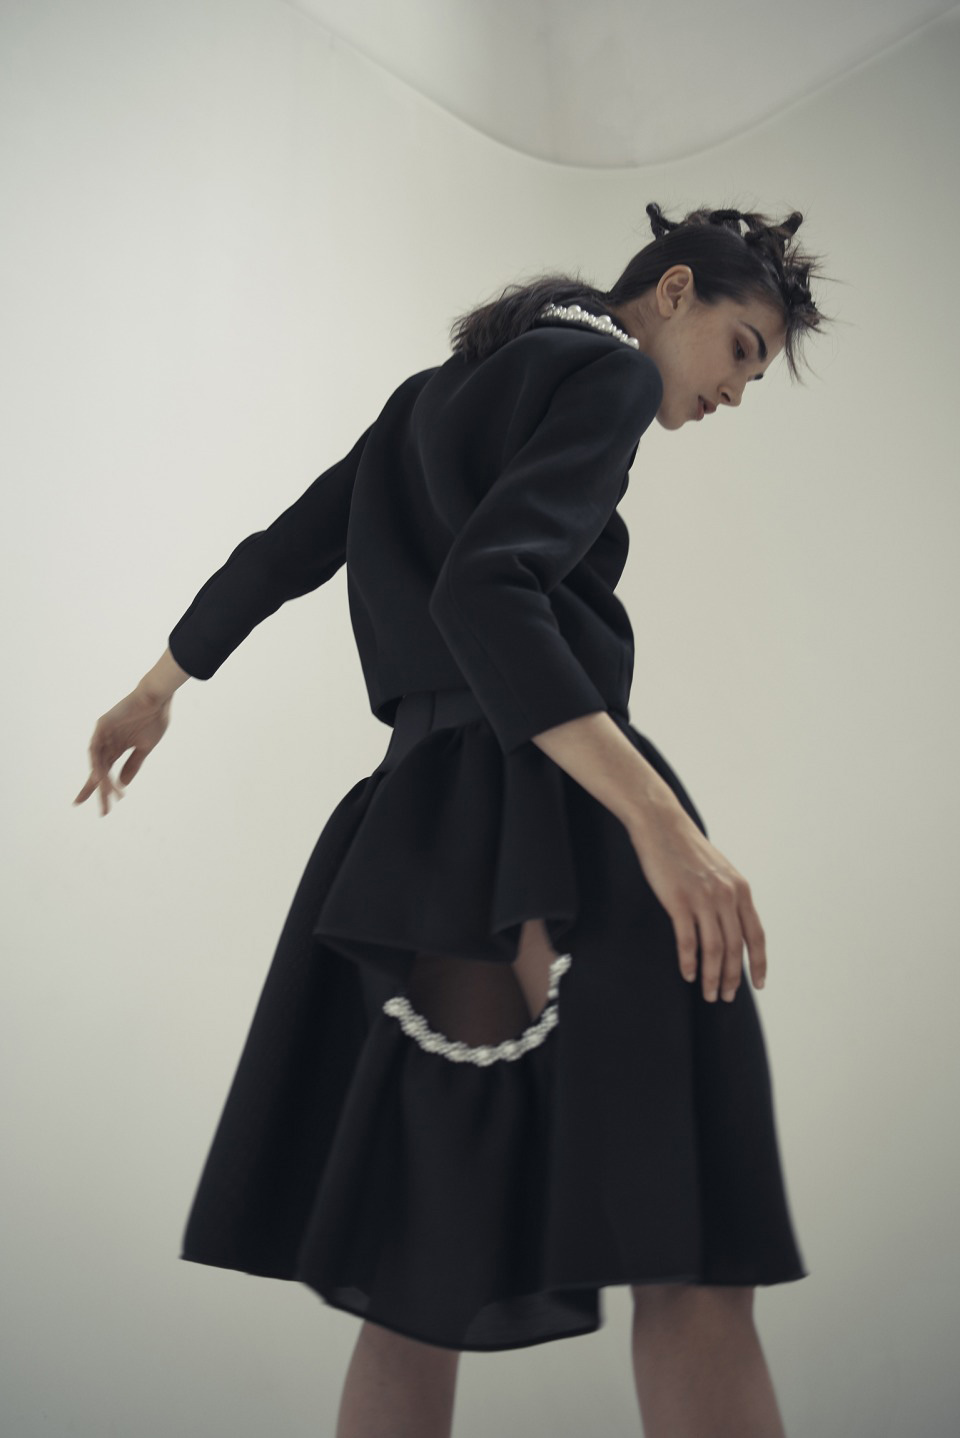 Rob Rusling (ボブ・ラスリング) 撮影、モデル Ana Buljevic (アナ・バルジェヴィック) | Image via showstudio.com